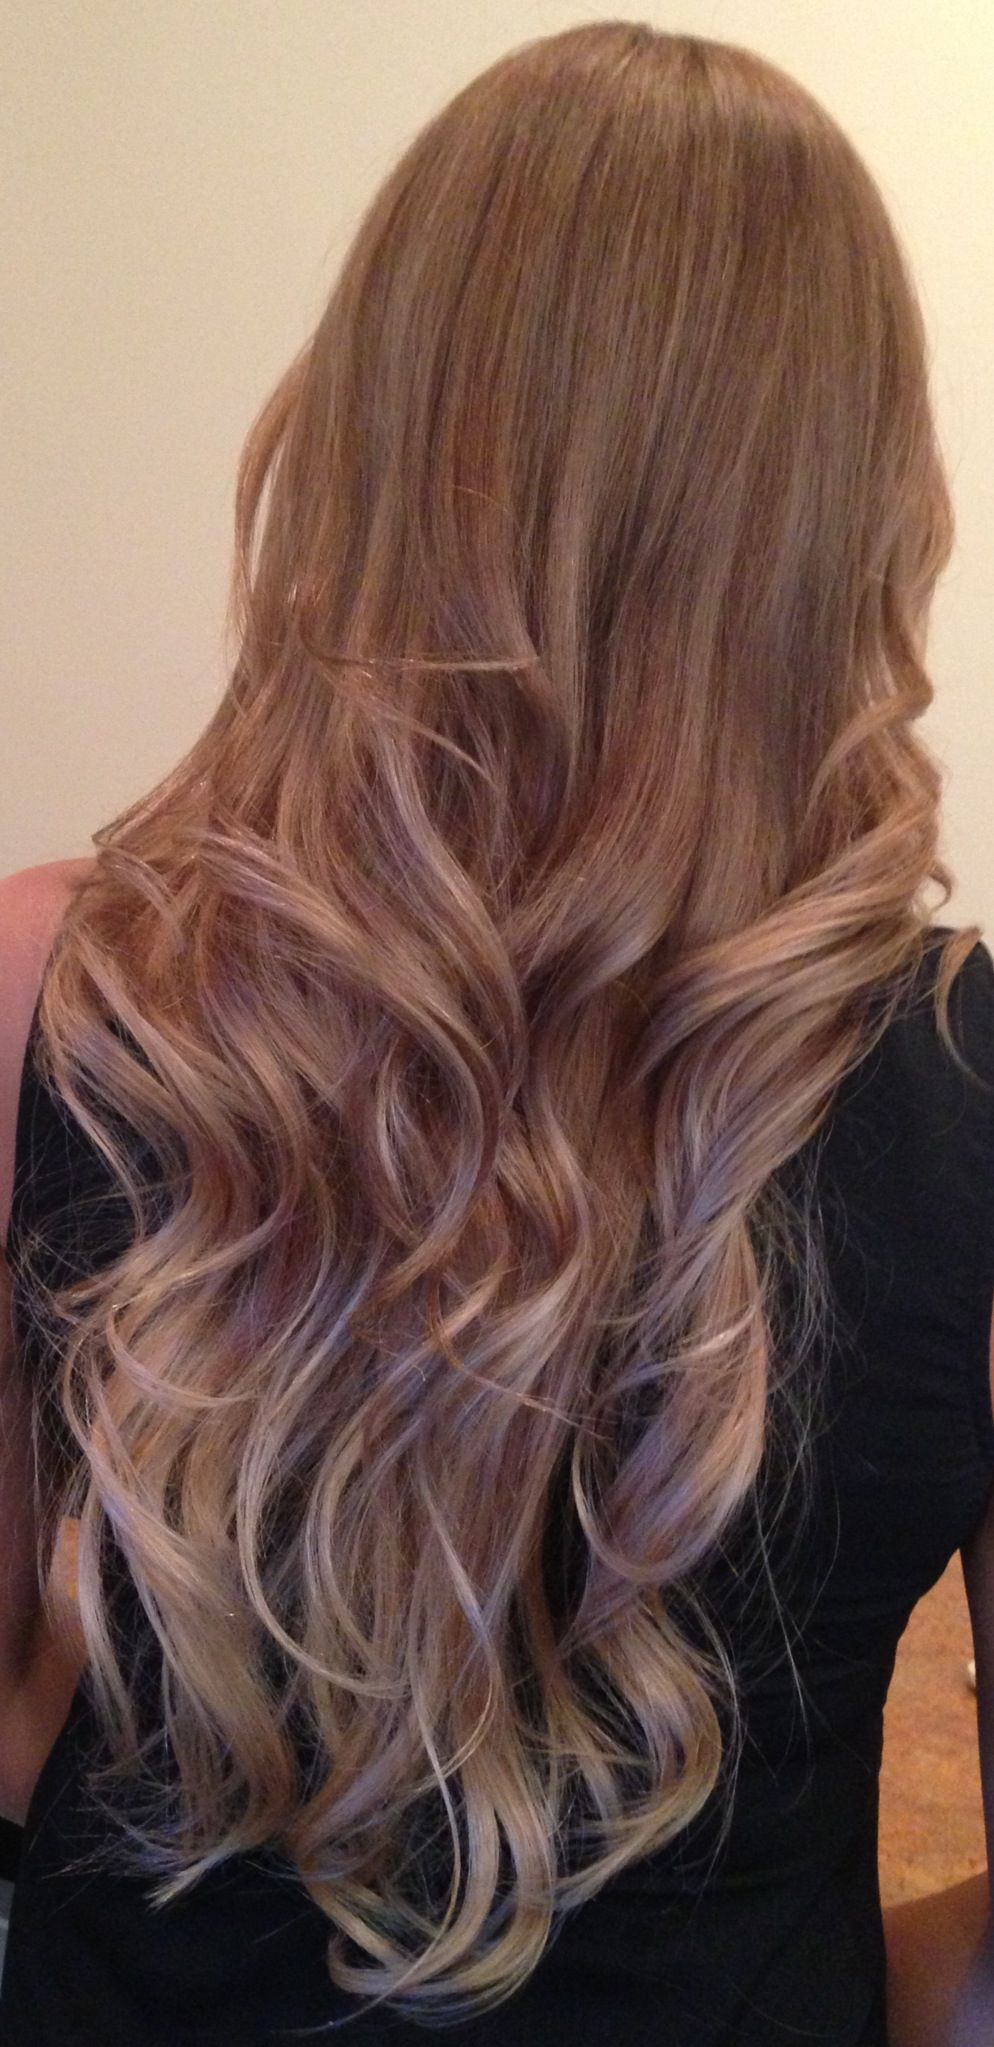 Brown To Light Blonde